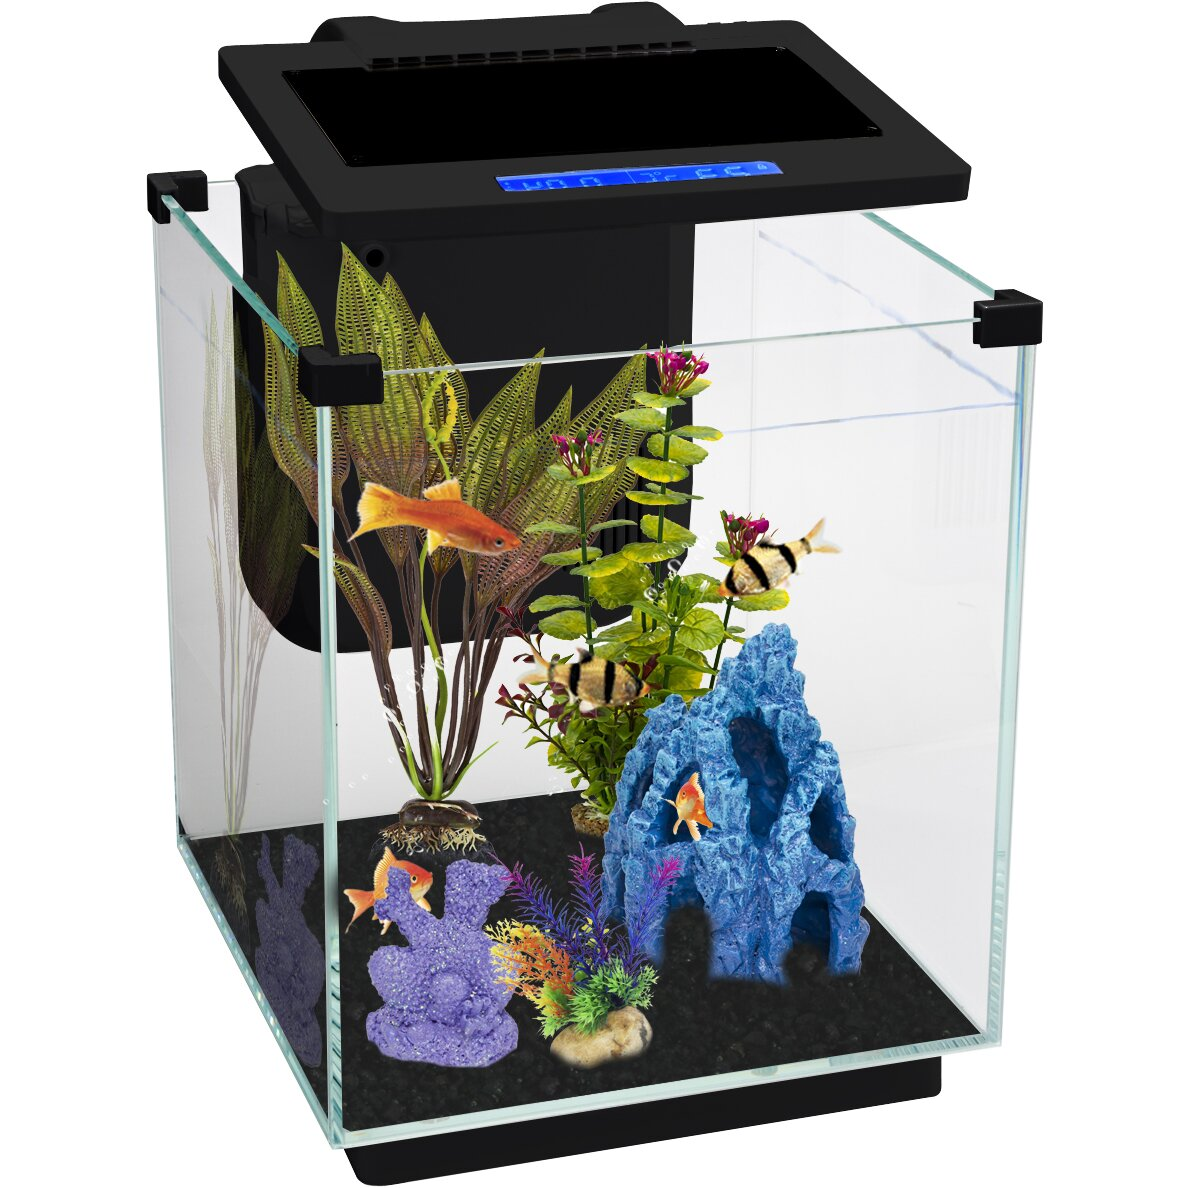 Penn Plax Simplicity 5 5 Gallon Desktop Aquarium Tank